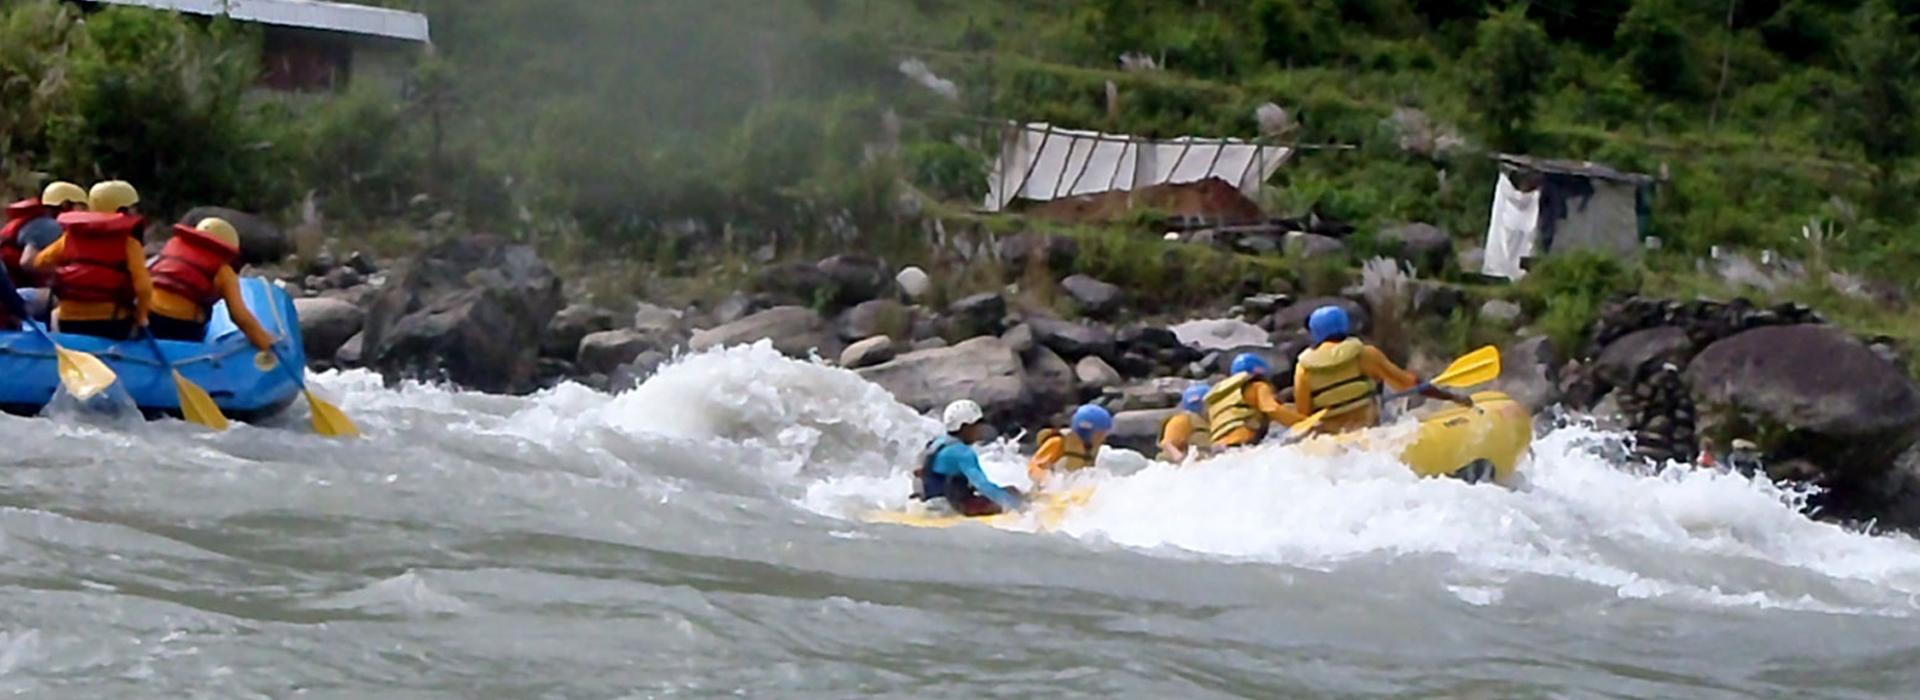 Bhote Koshi River Rafting